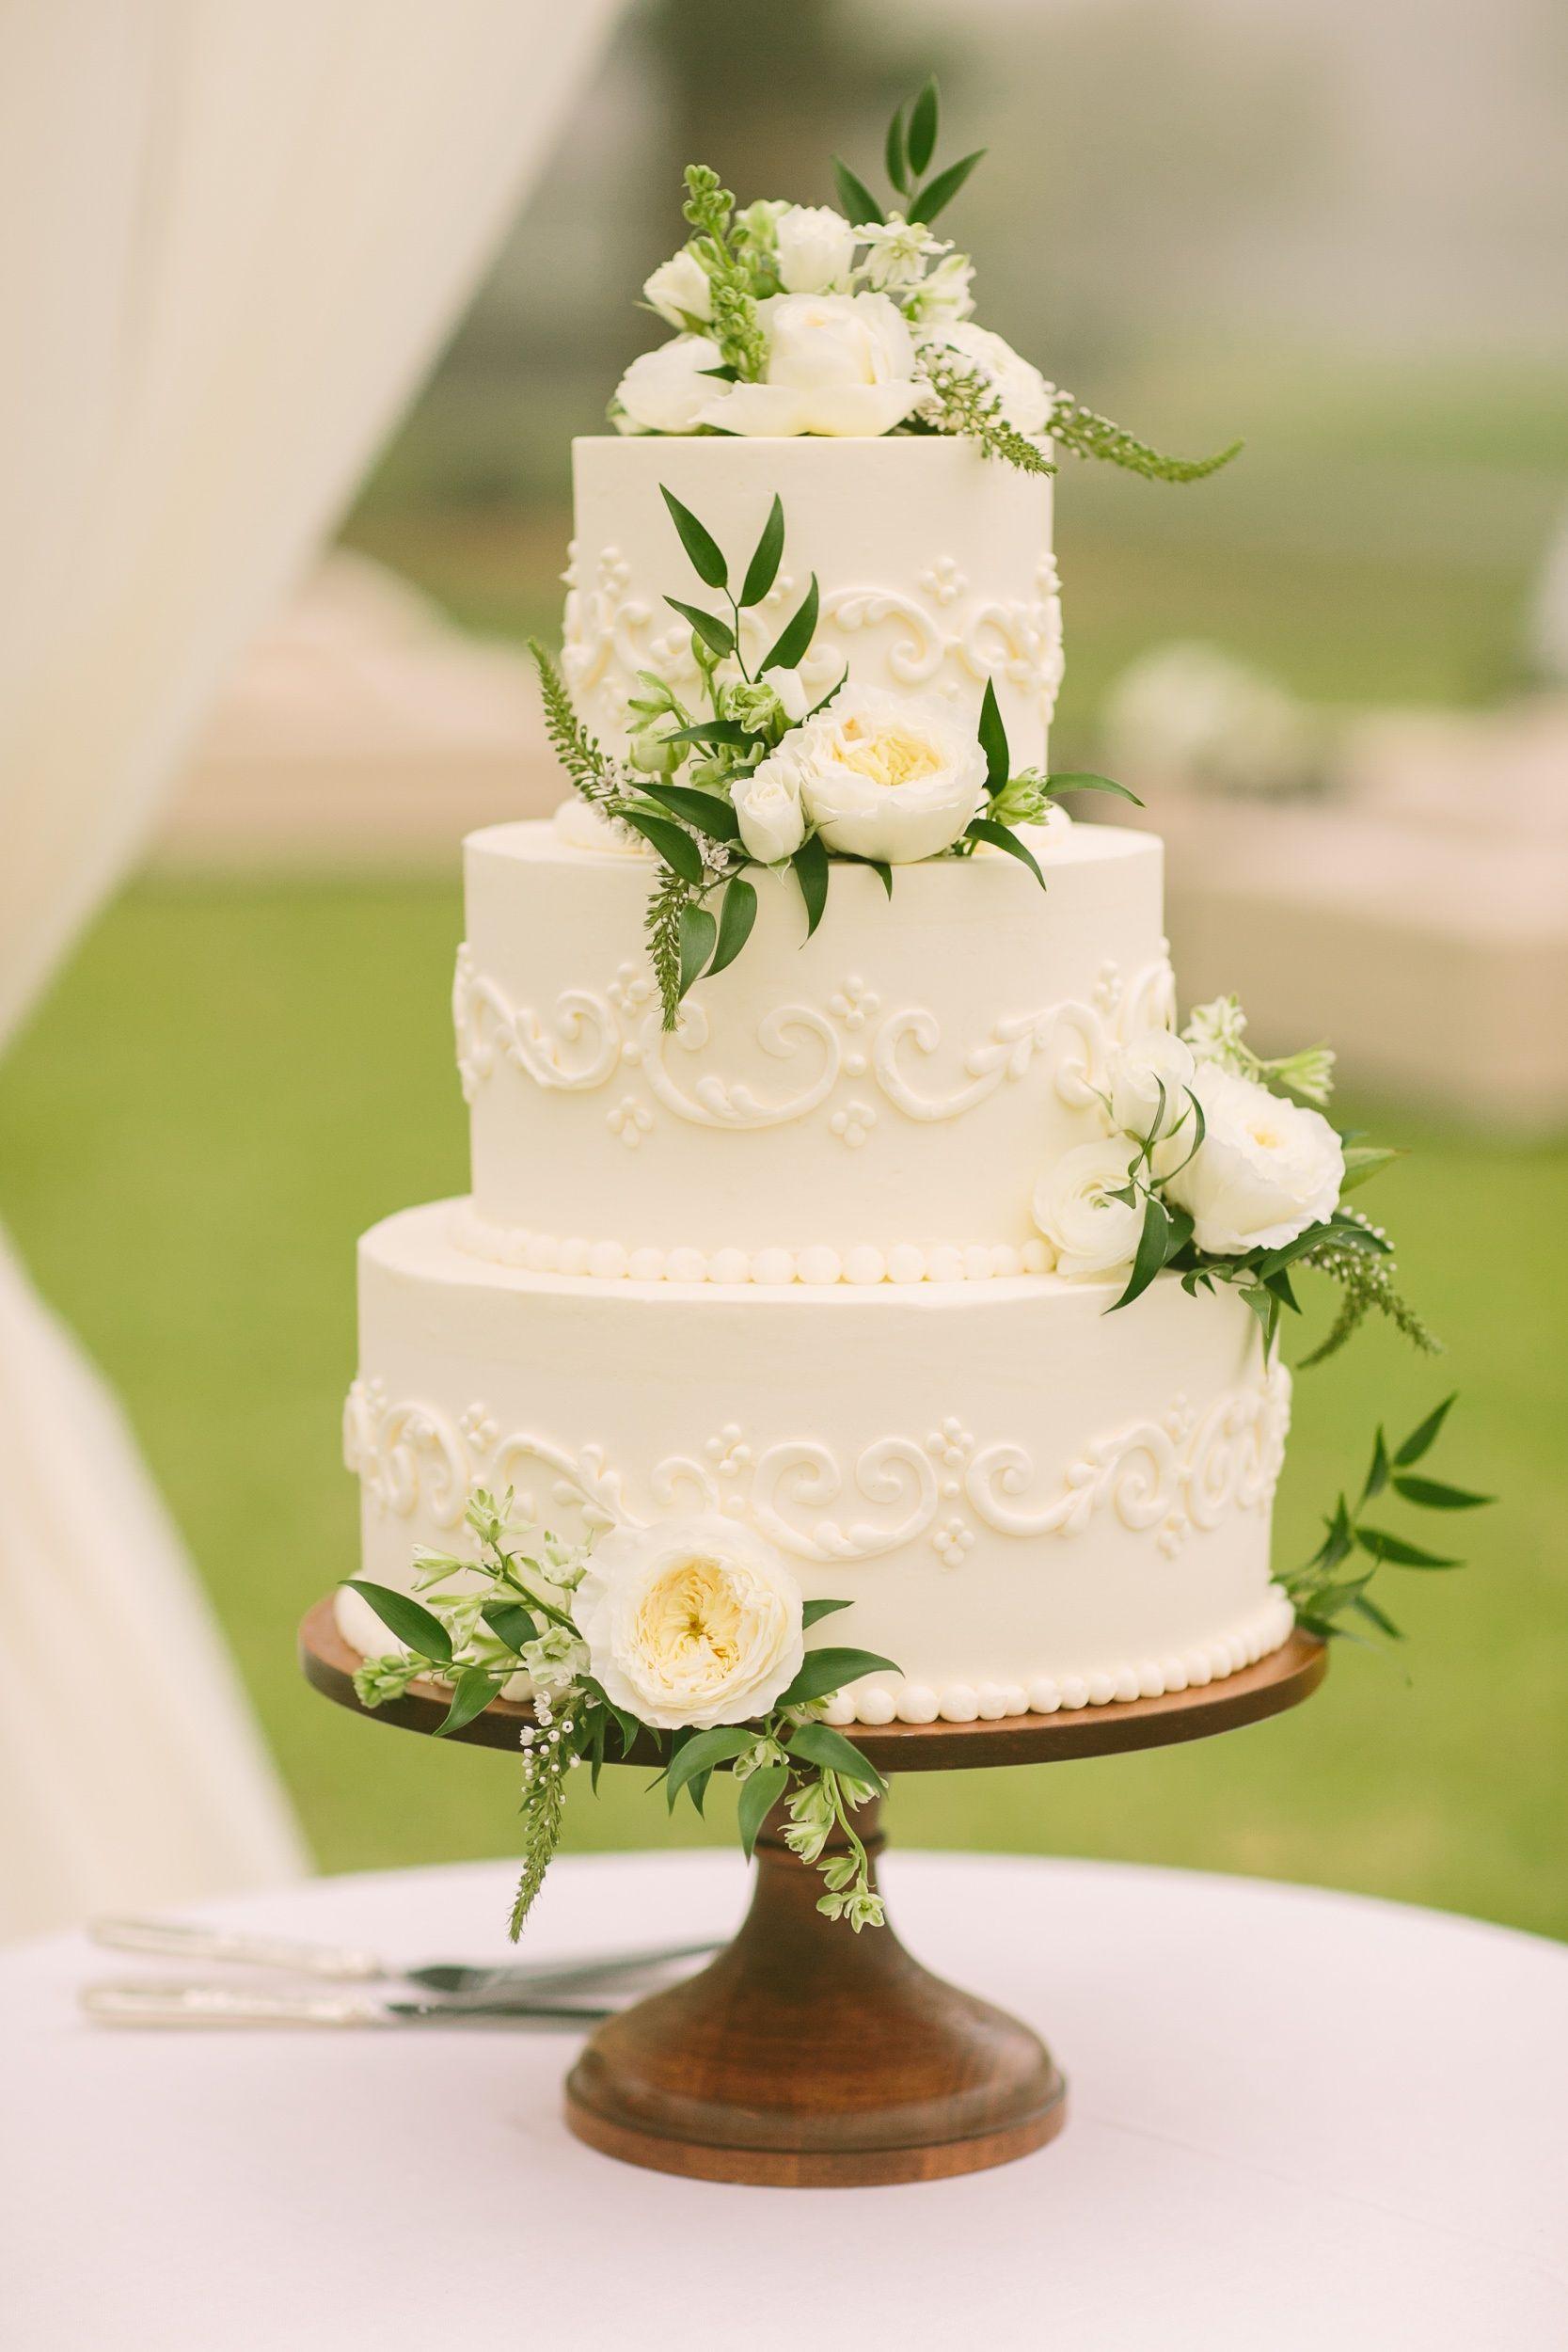 11 Hot Spring Wedding Trends for 2016 | The 2015 Bride | Pinterest ...